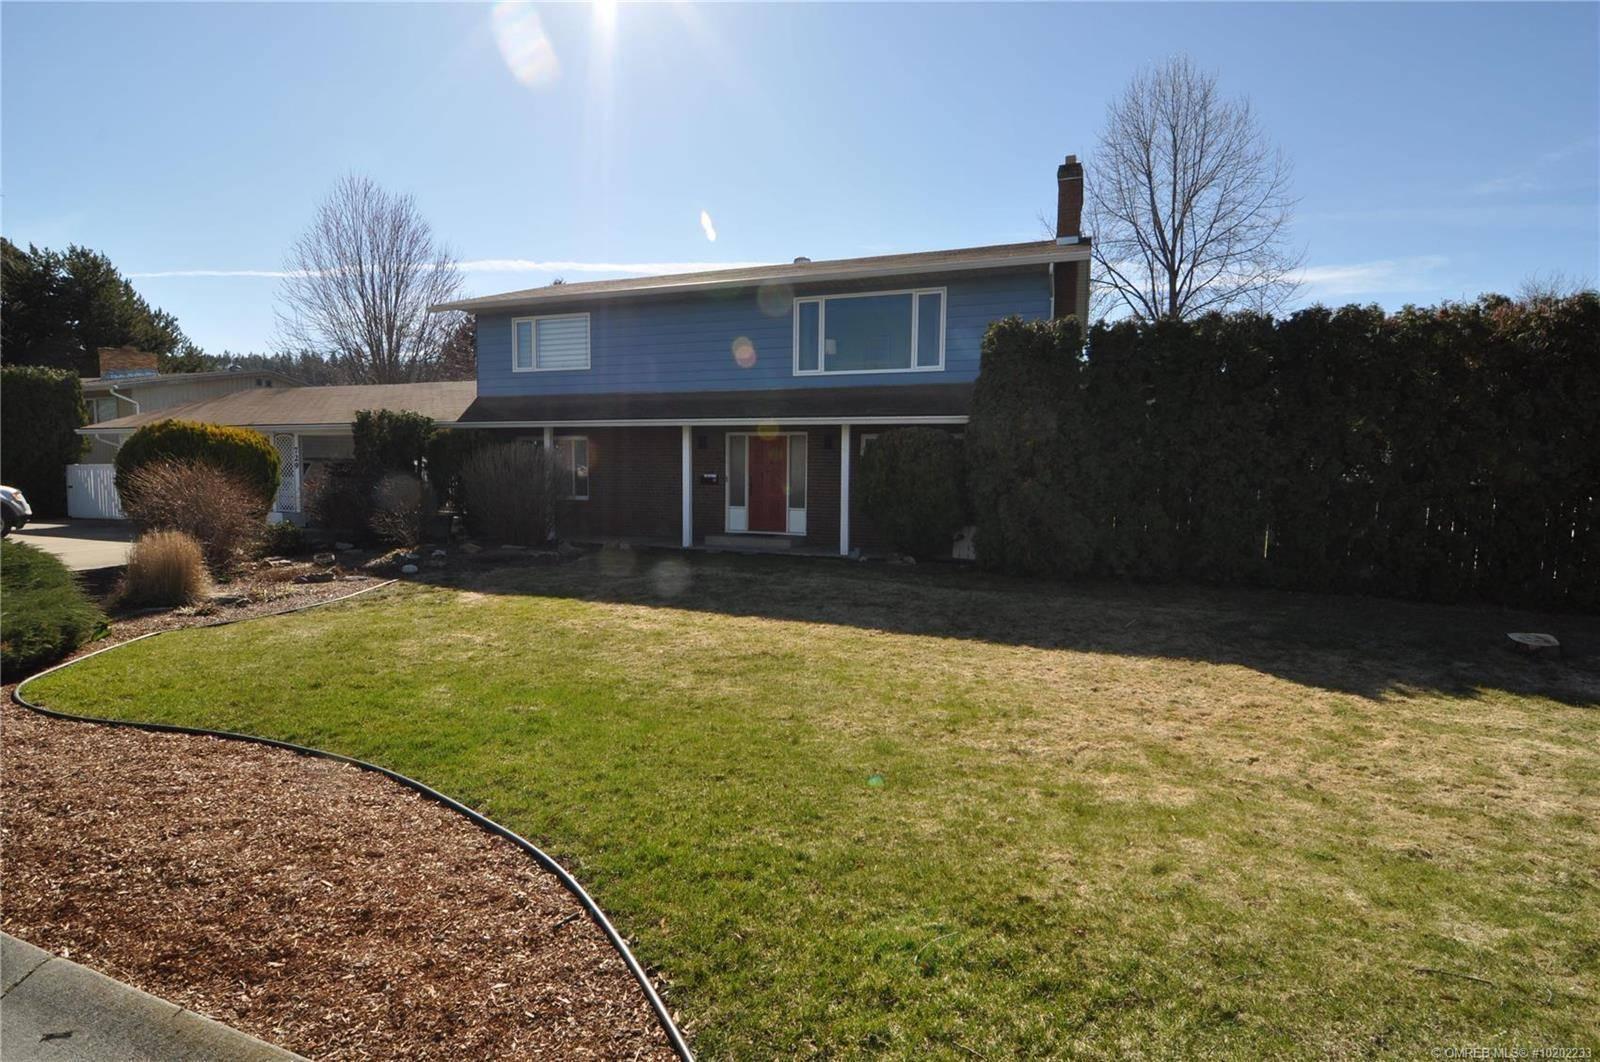 House for sale at 729 Turner Rd Kelowna British Columbia - MLS: 10202233